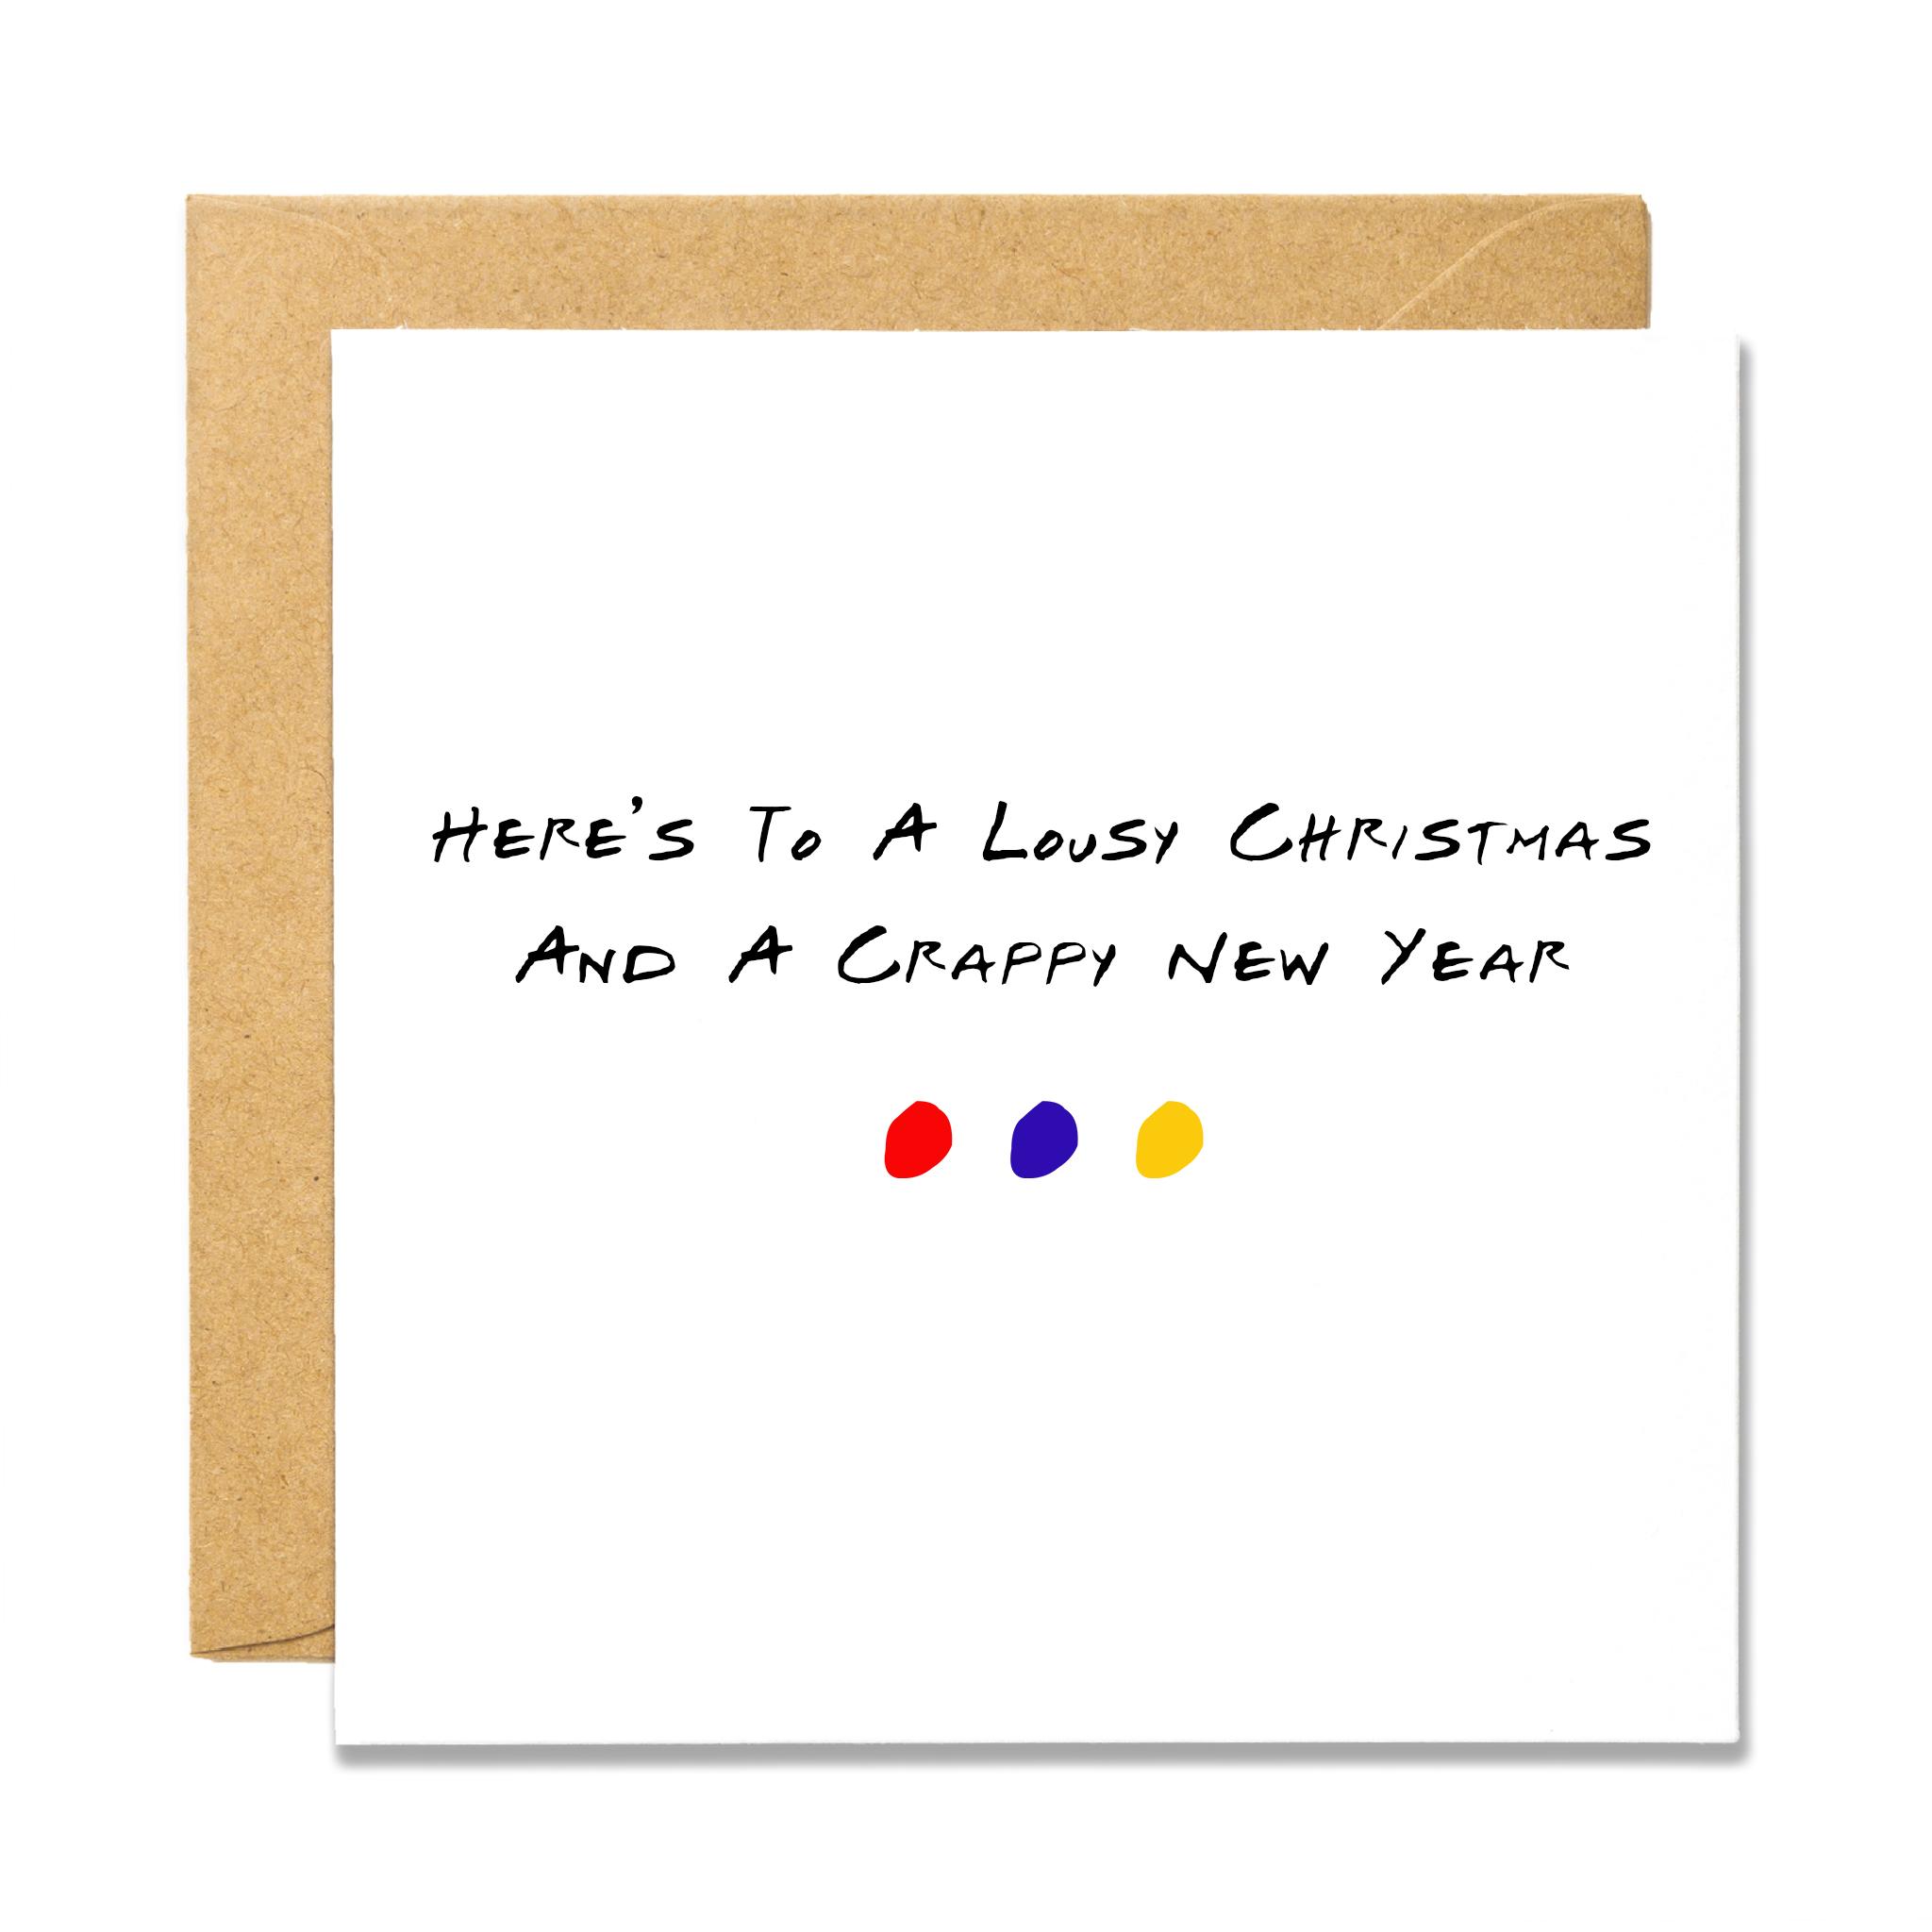 Lousy Christmas